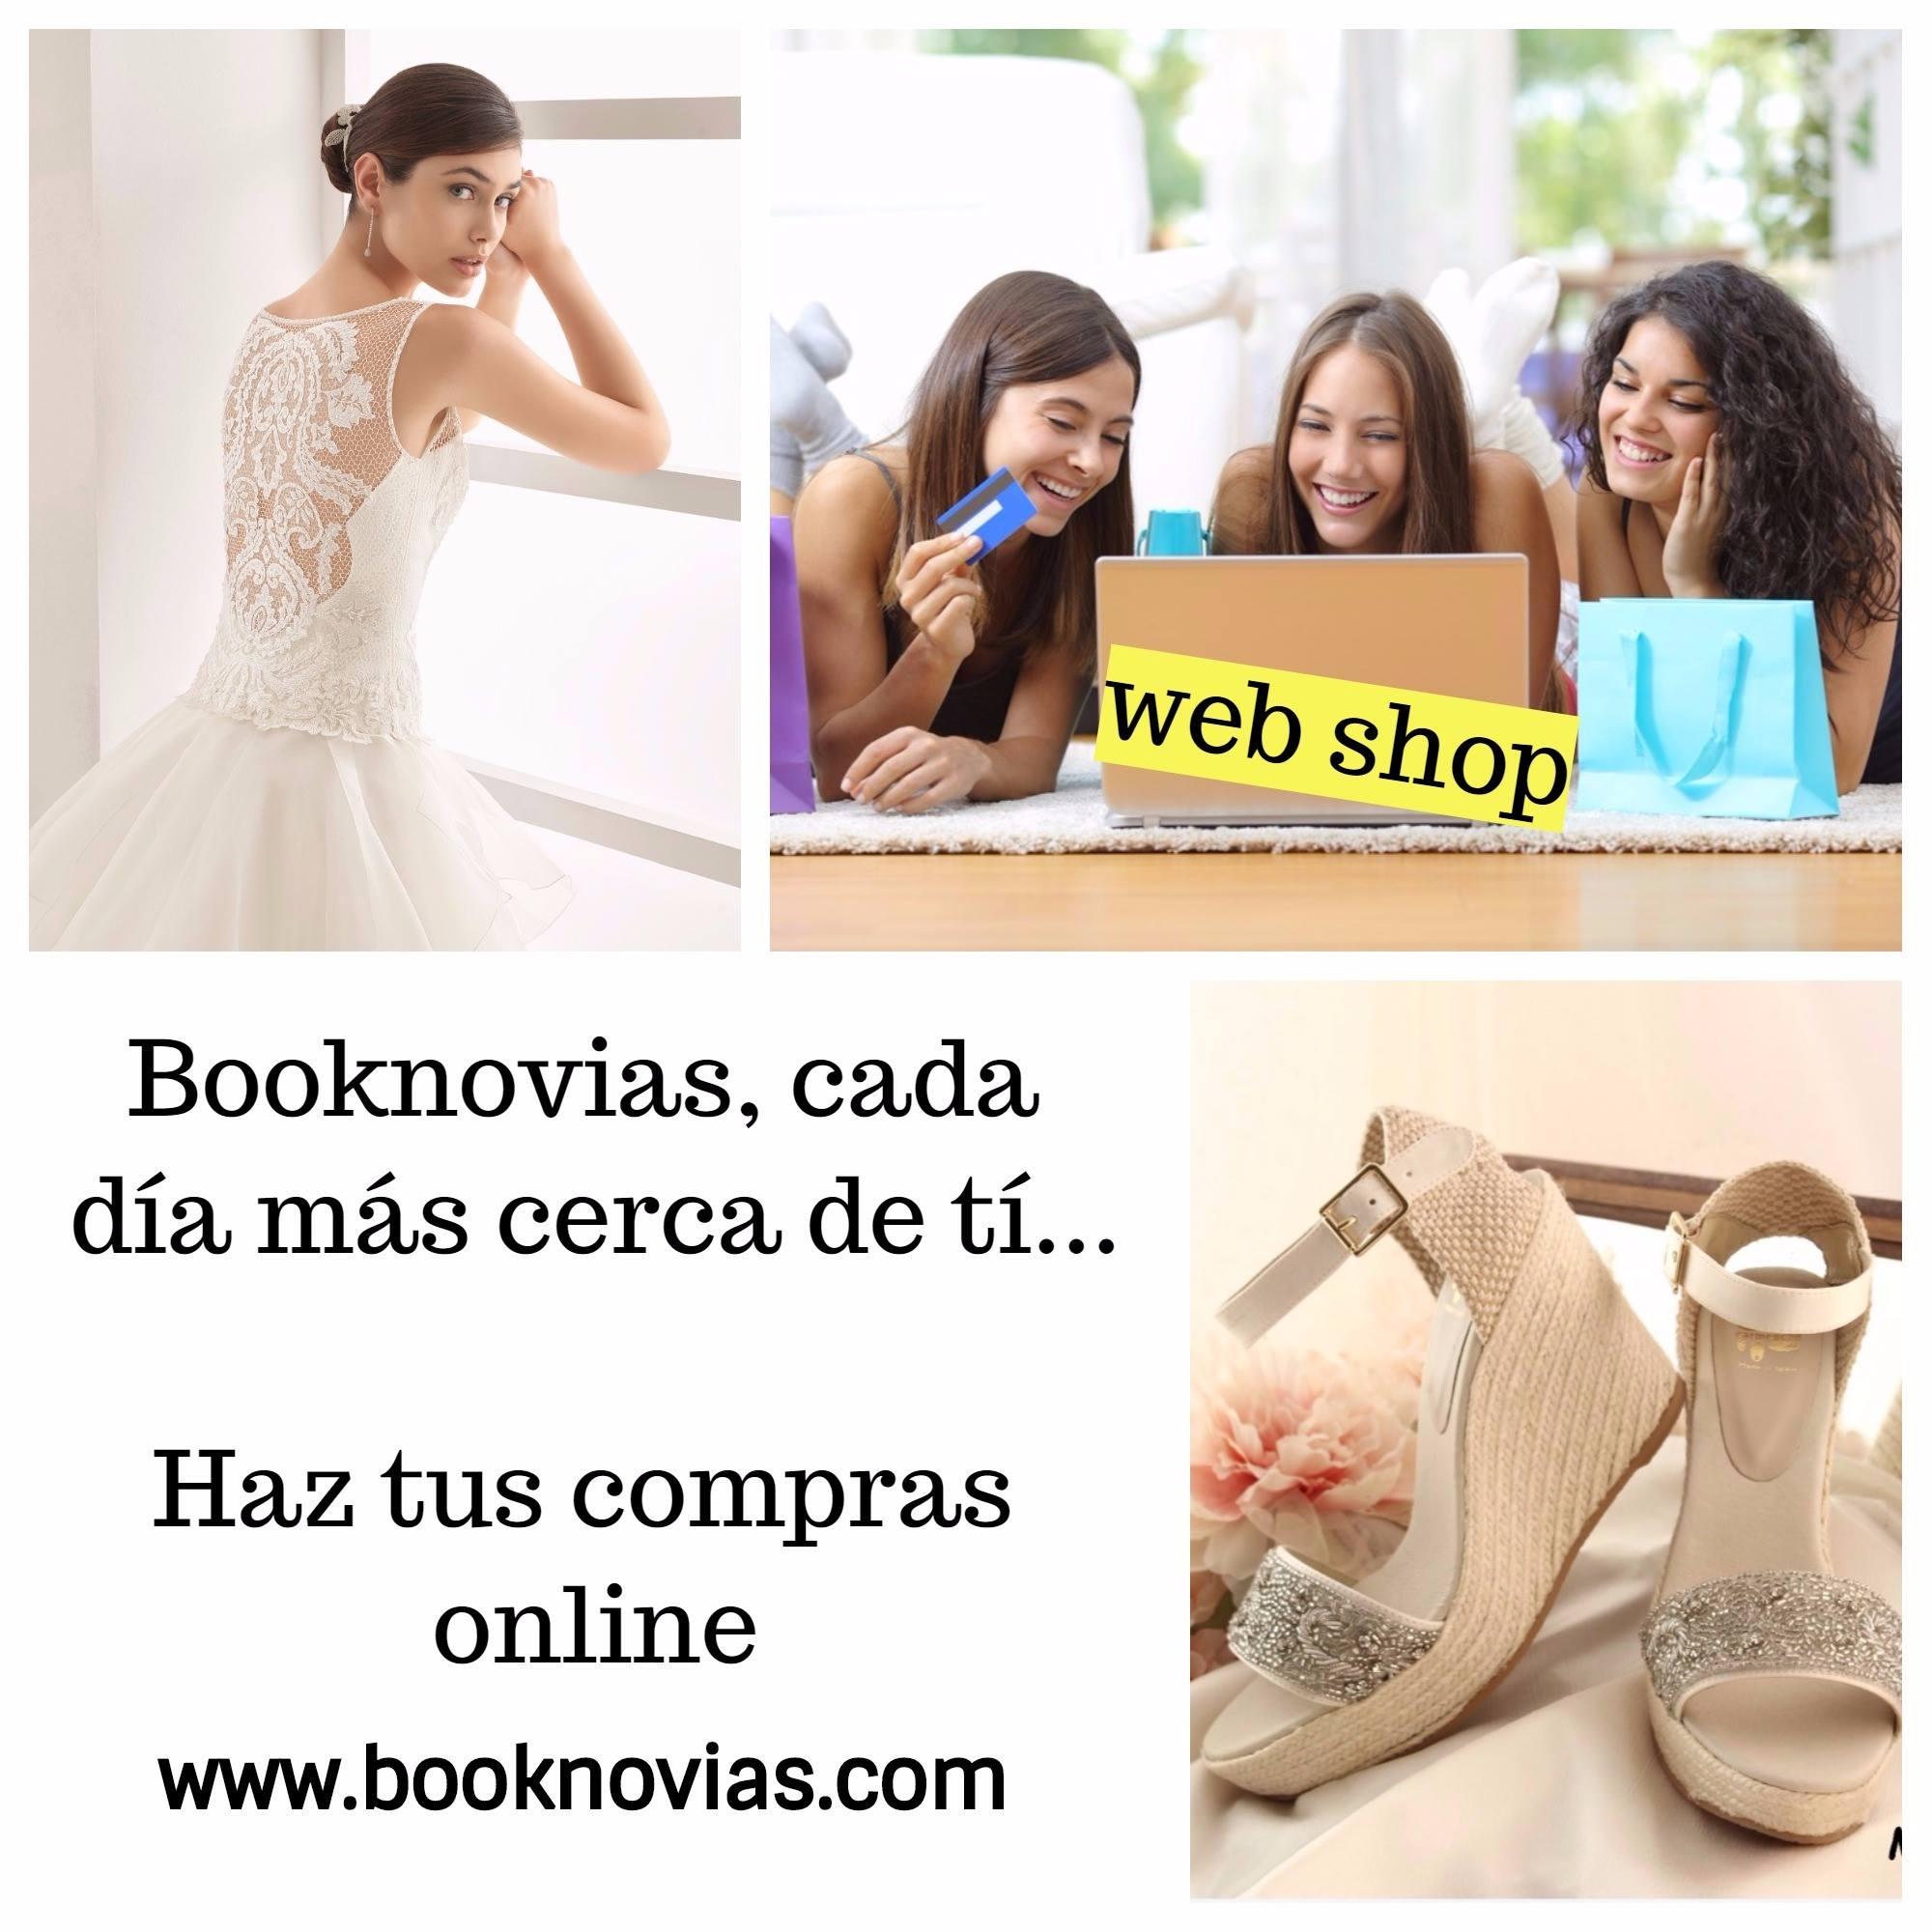 Booknovias Shop Online